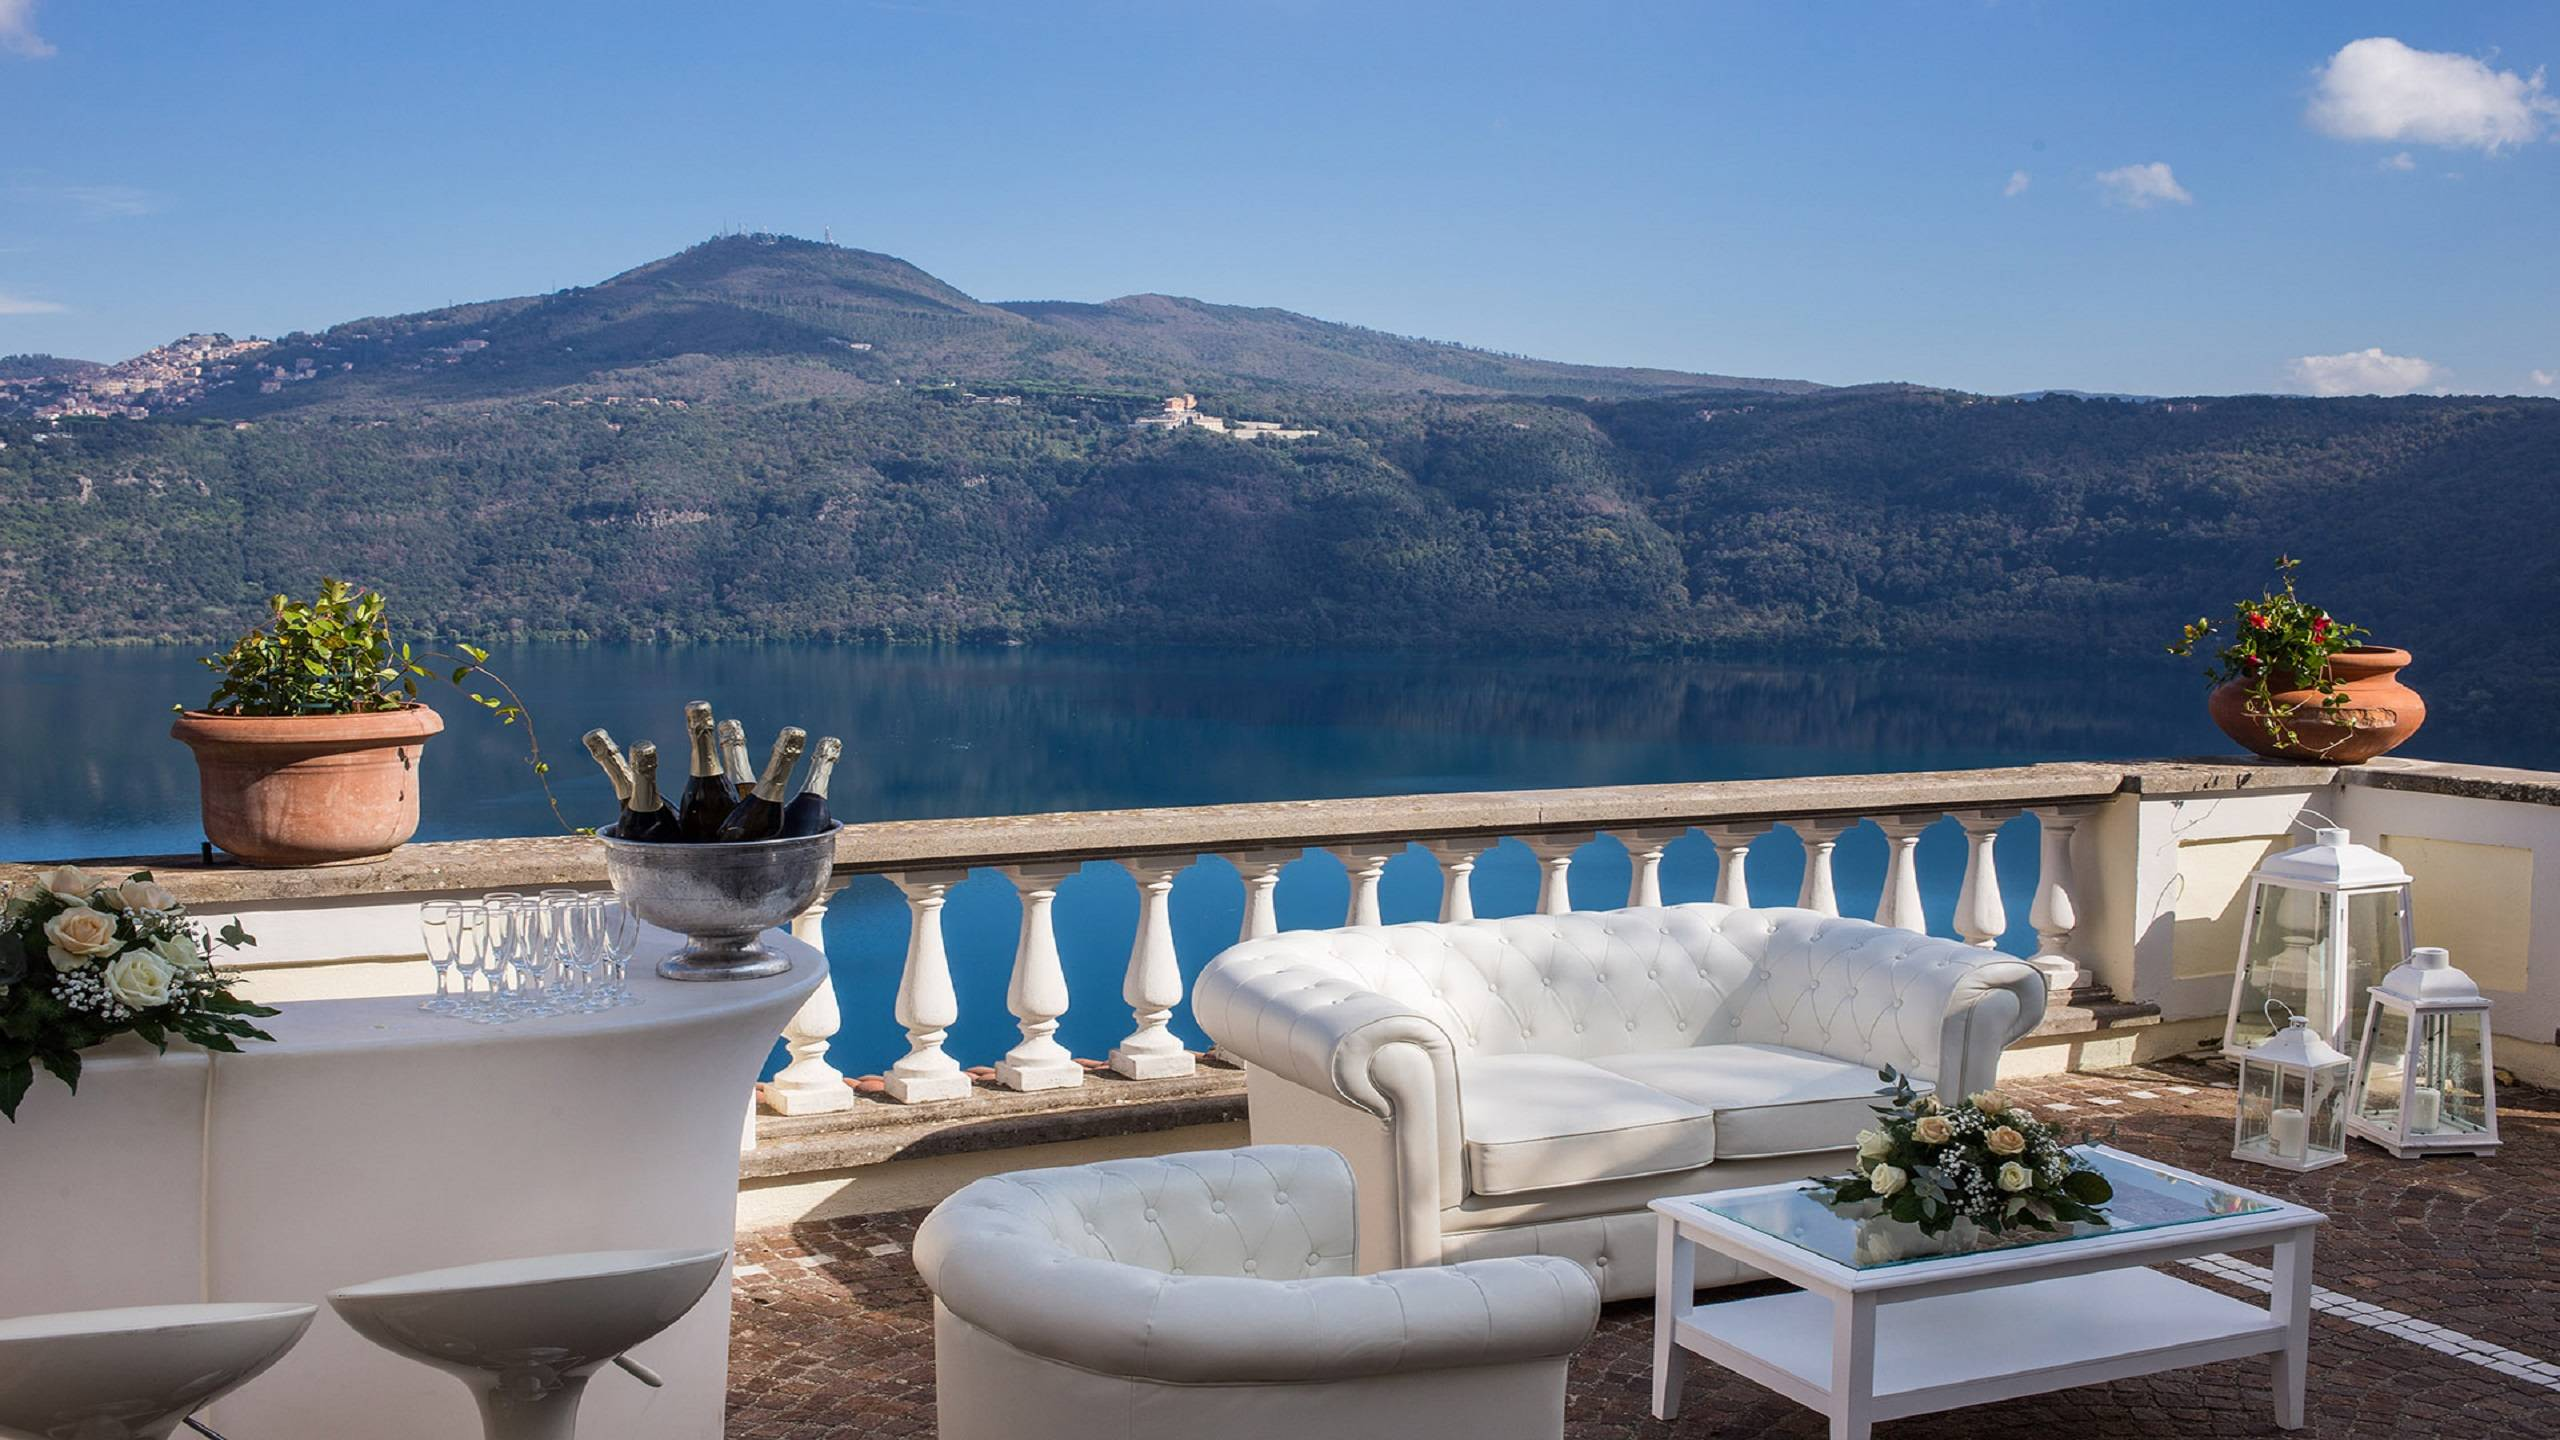 Hotel-Castel-Vecchio-Terrace-Lake-Castel-Gandolfo